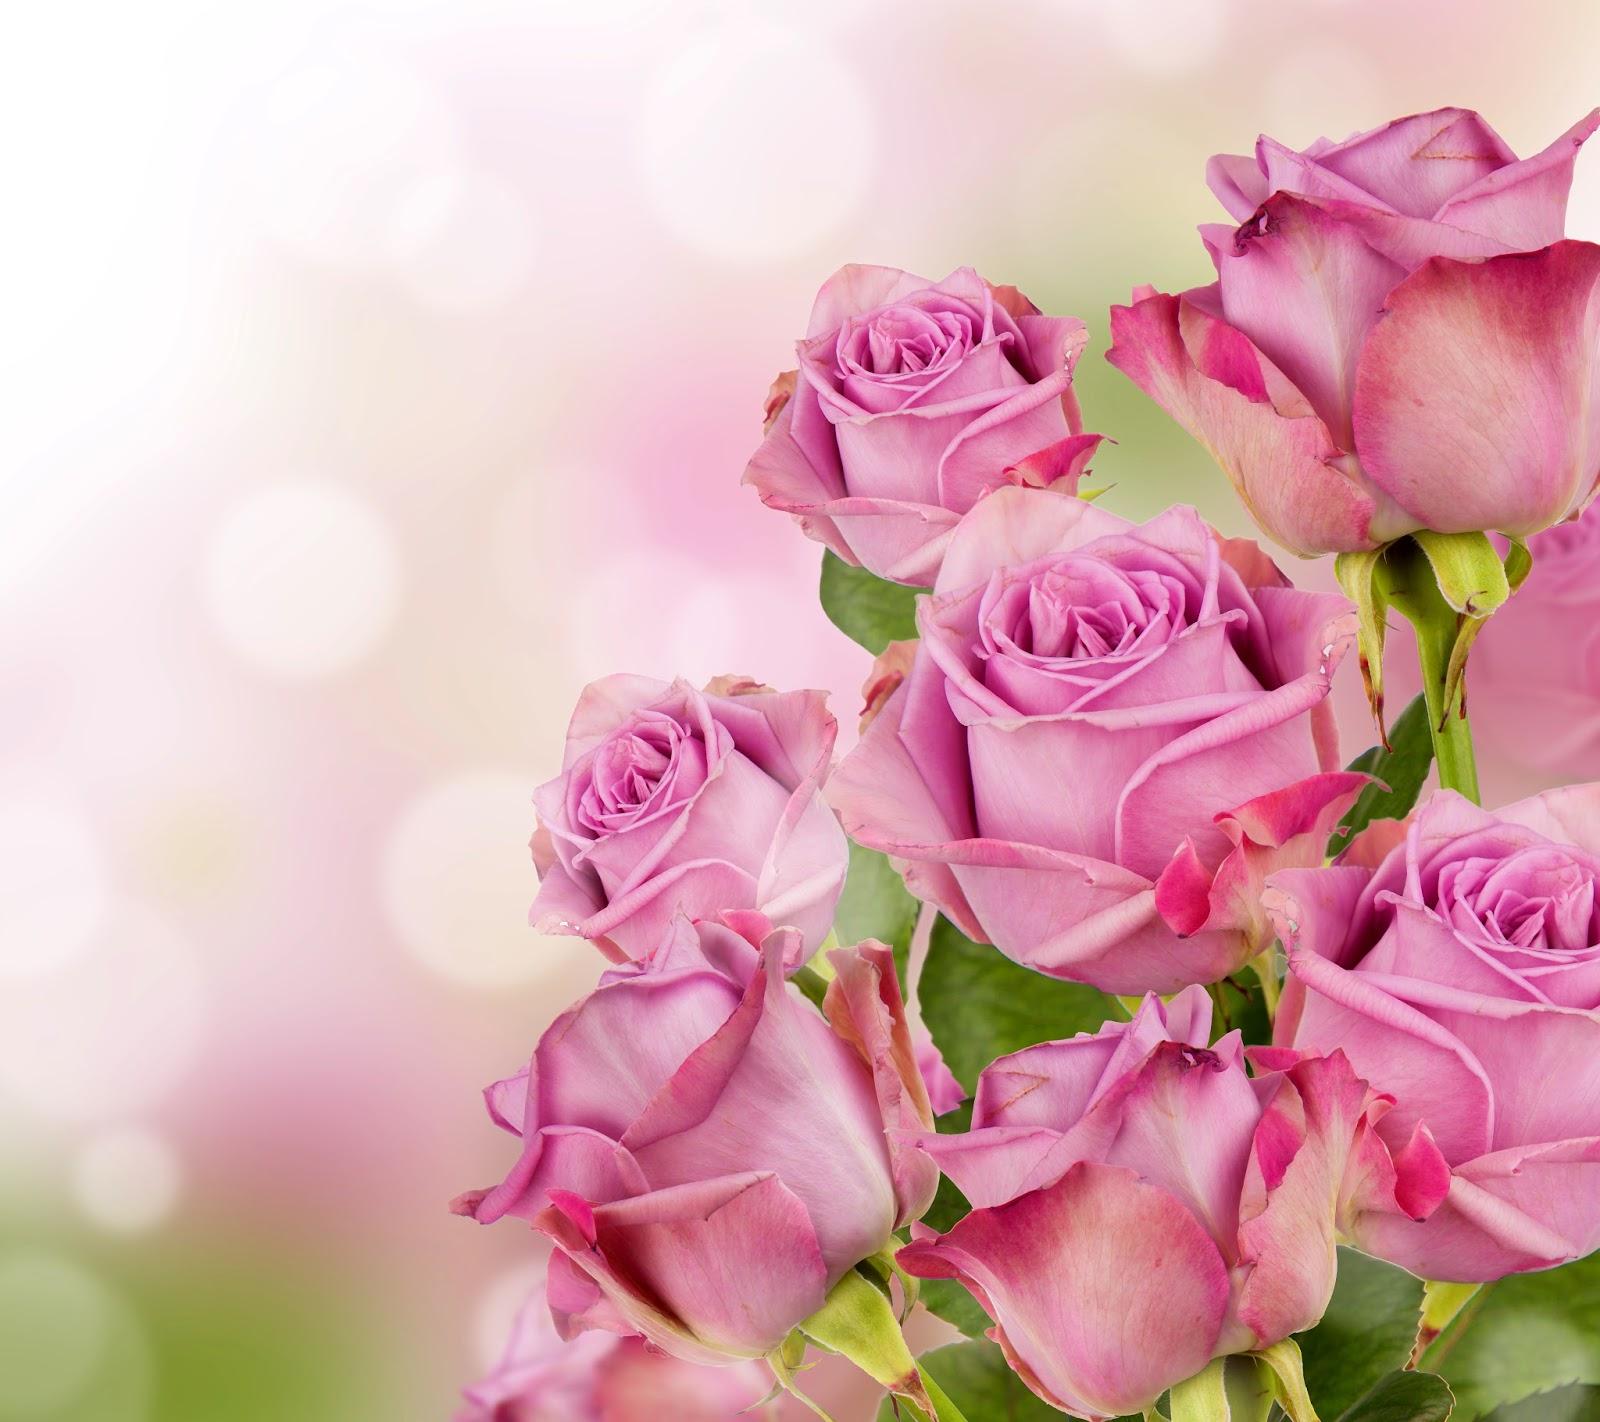 Rose flowers beautiful pink roses nature beauty izmirmasajfo